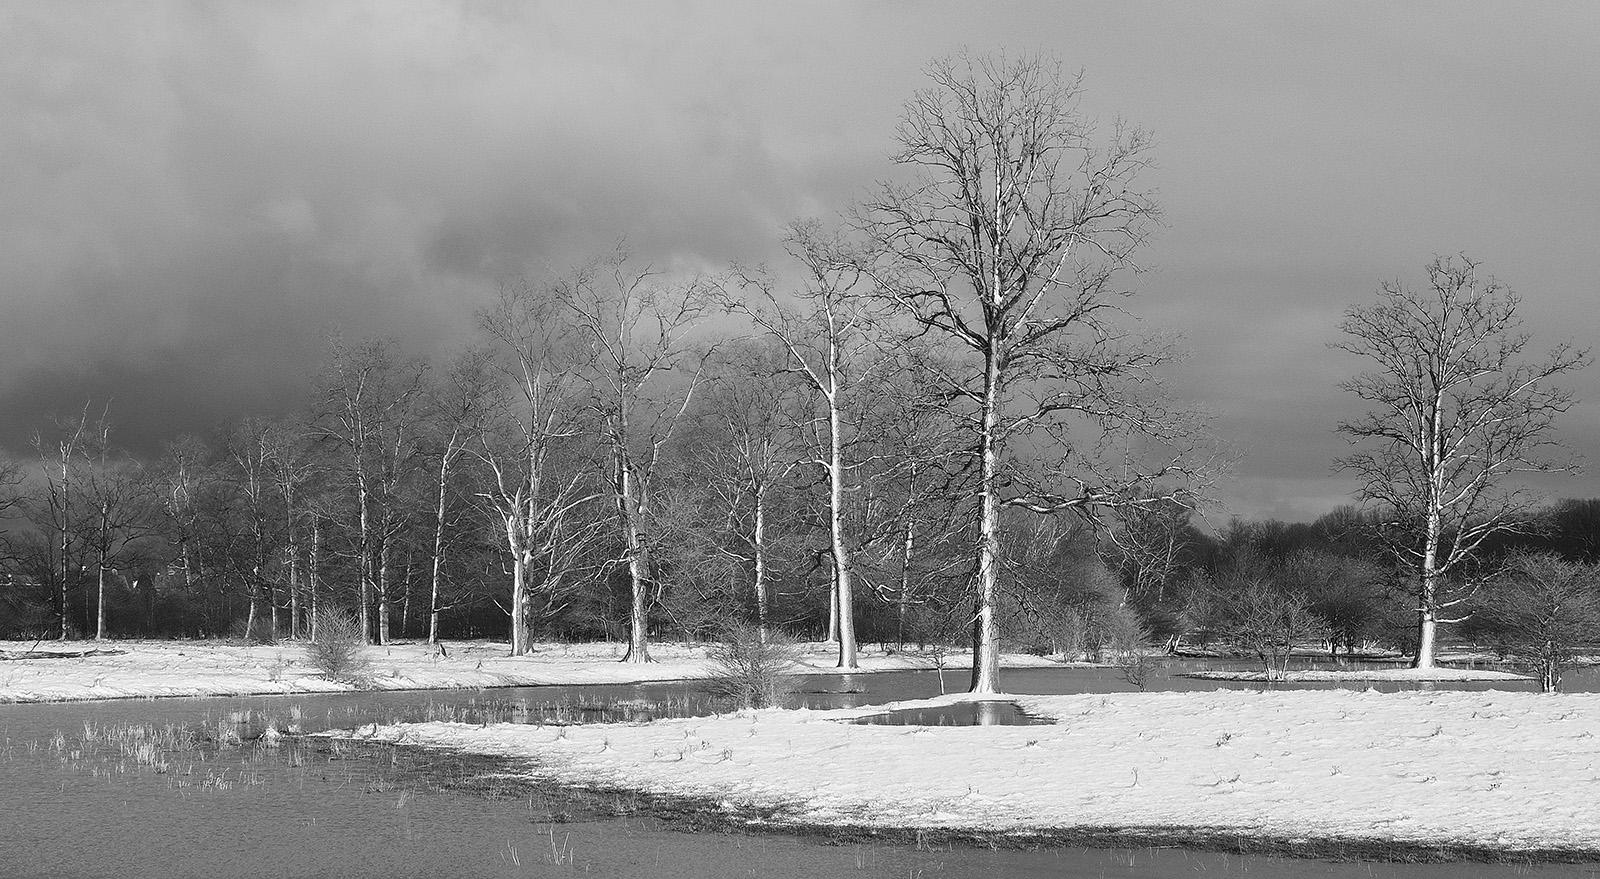 Wellesley Ontario floodplain landscape black and white photograph